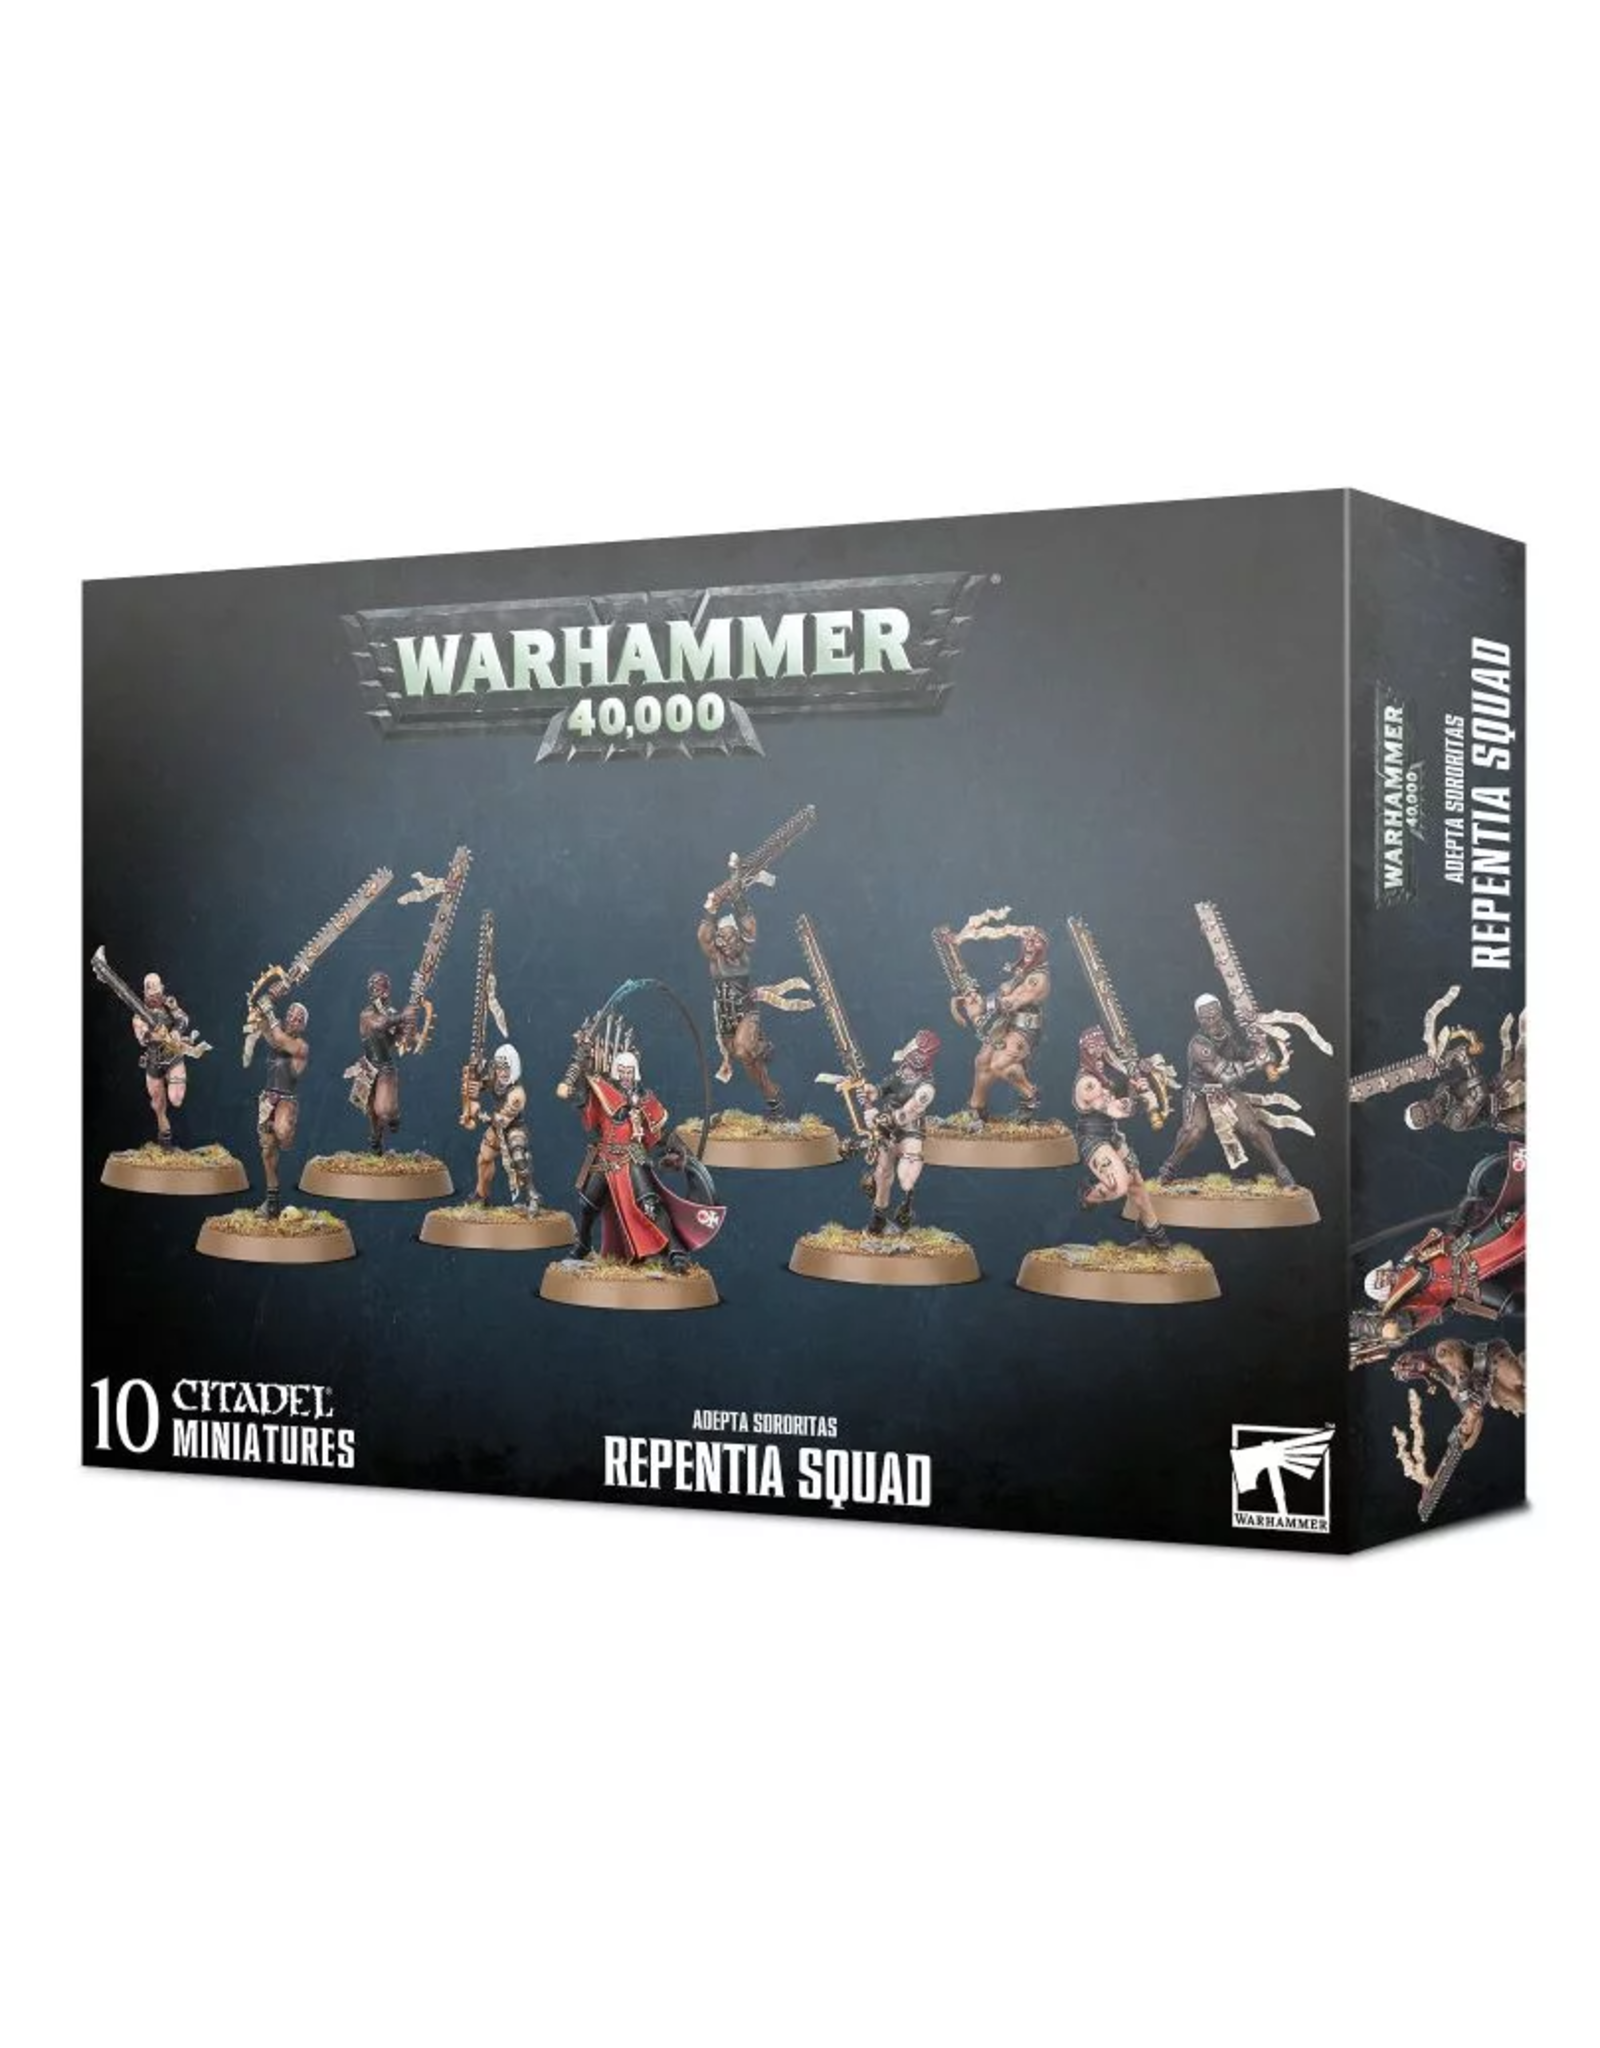 Games Workshop Warhammer 40K: Adepta Sororitas Repentia Squad